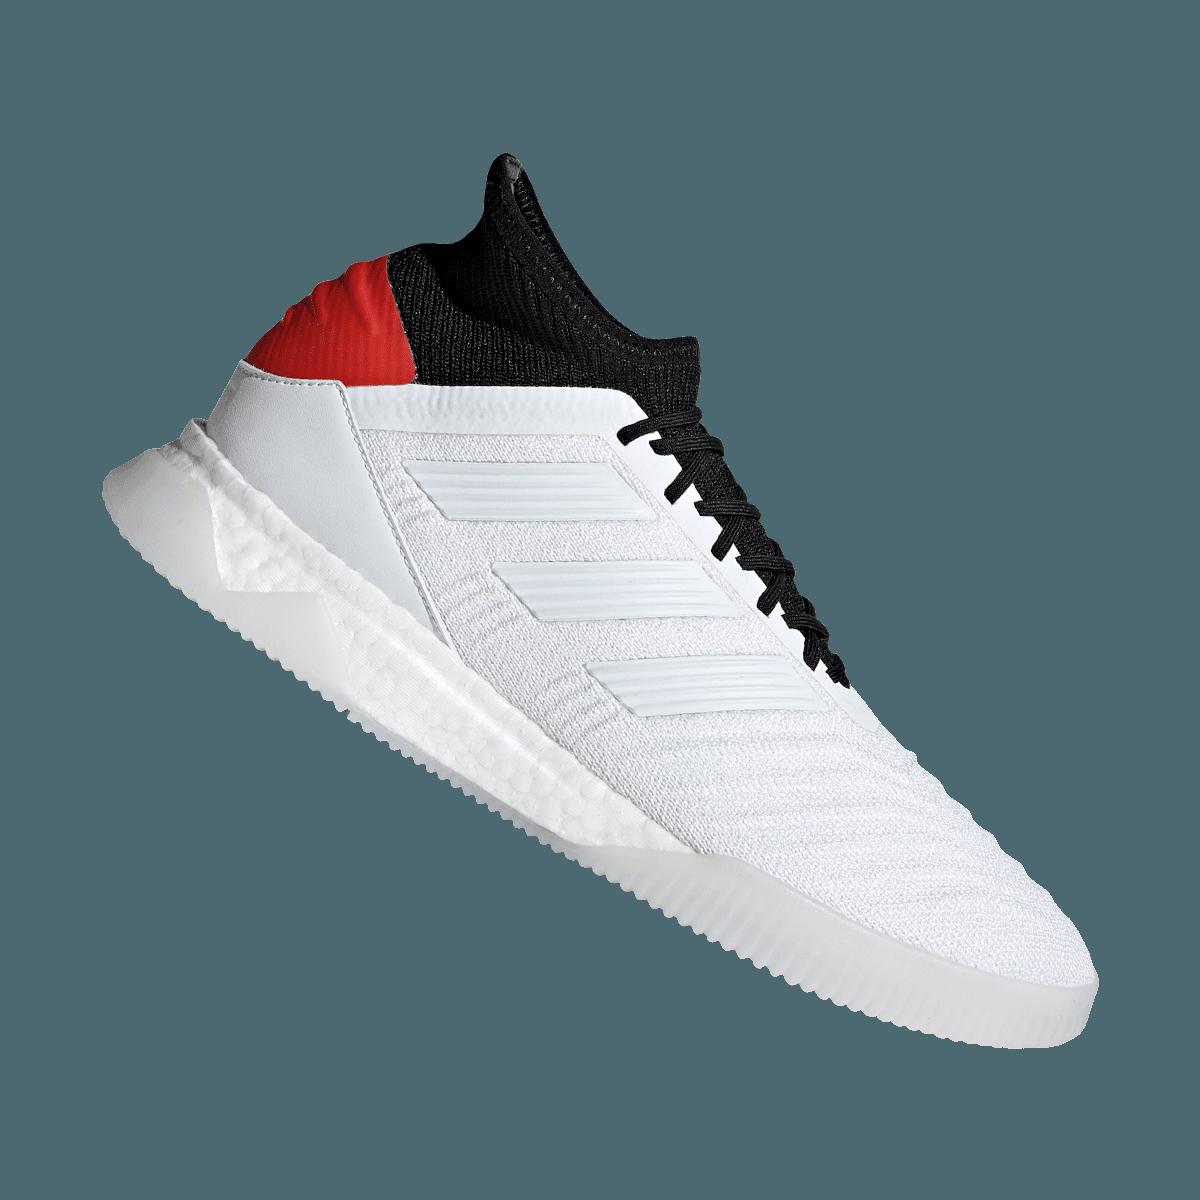 adidas Schuh Predator 19.1 TR weißrot Fussball Shop